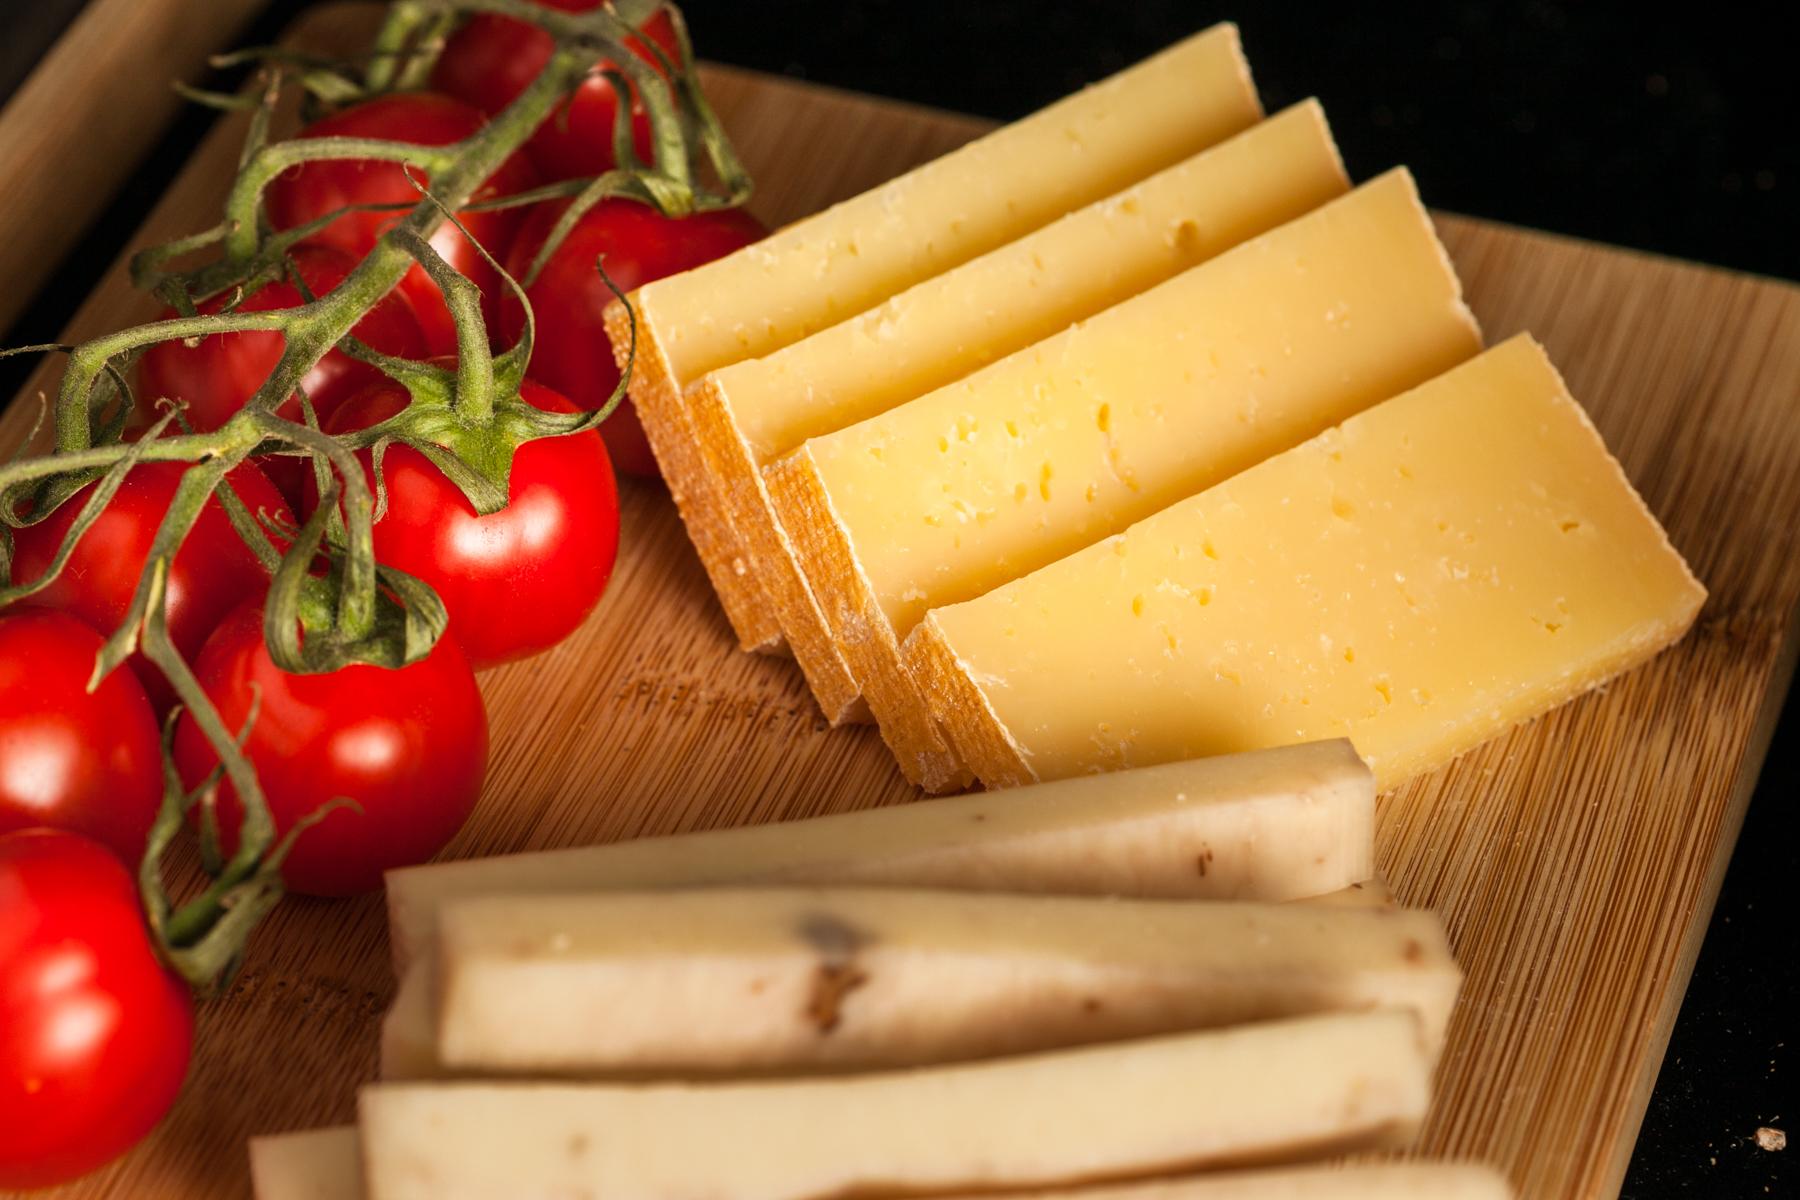 Indiferent daca au sau nu in componenta si condimentea, maturarea branzei Torockoi urmeaza acelasi proces complex.